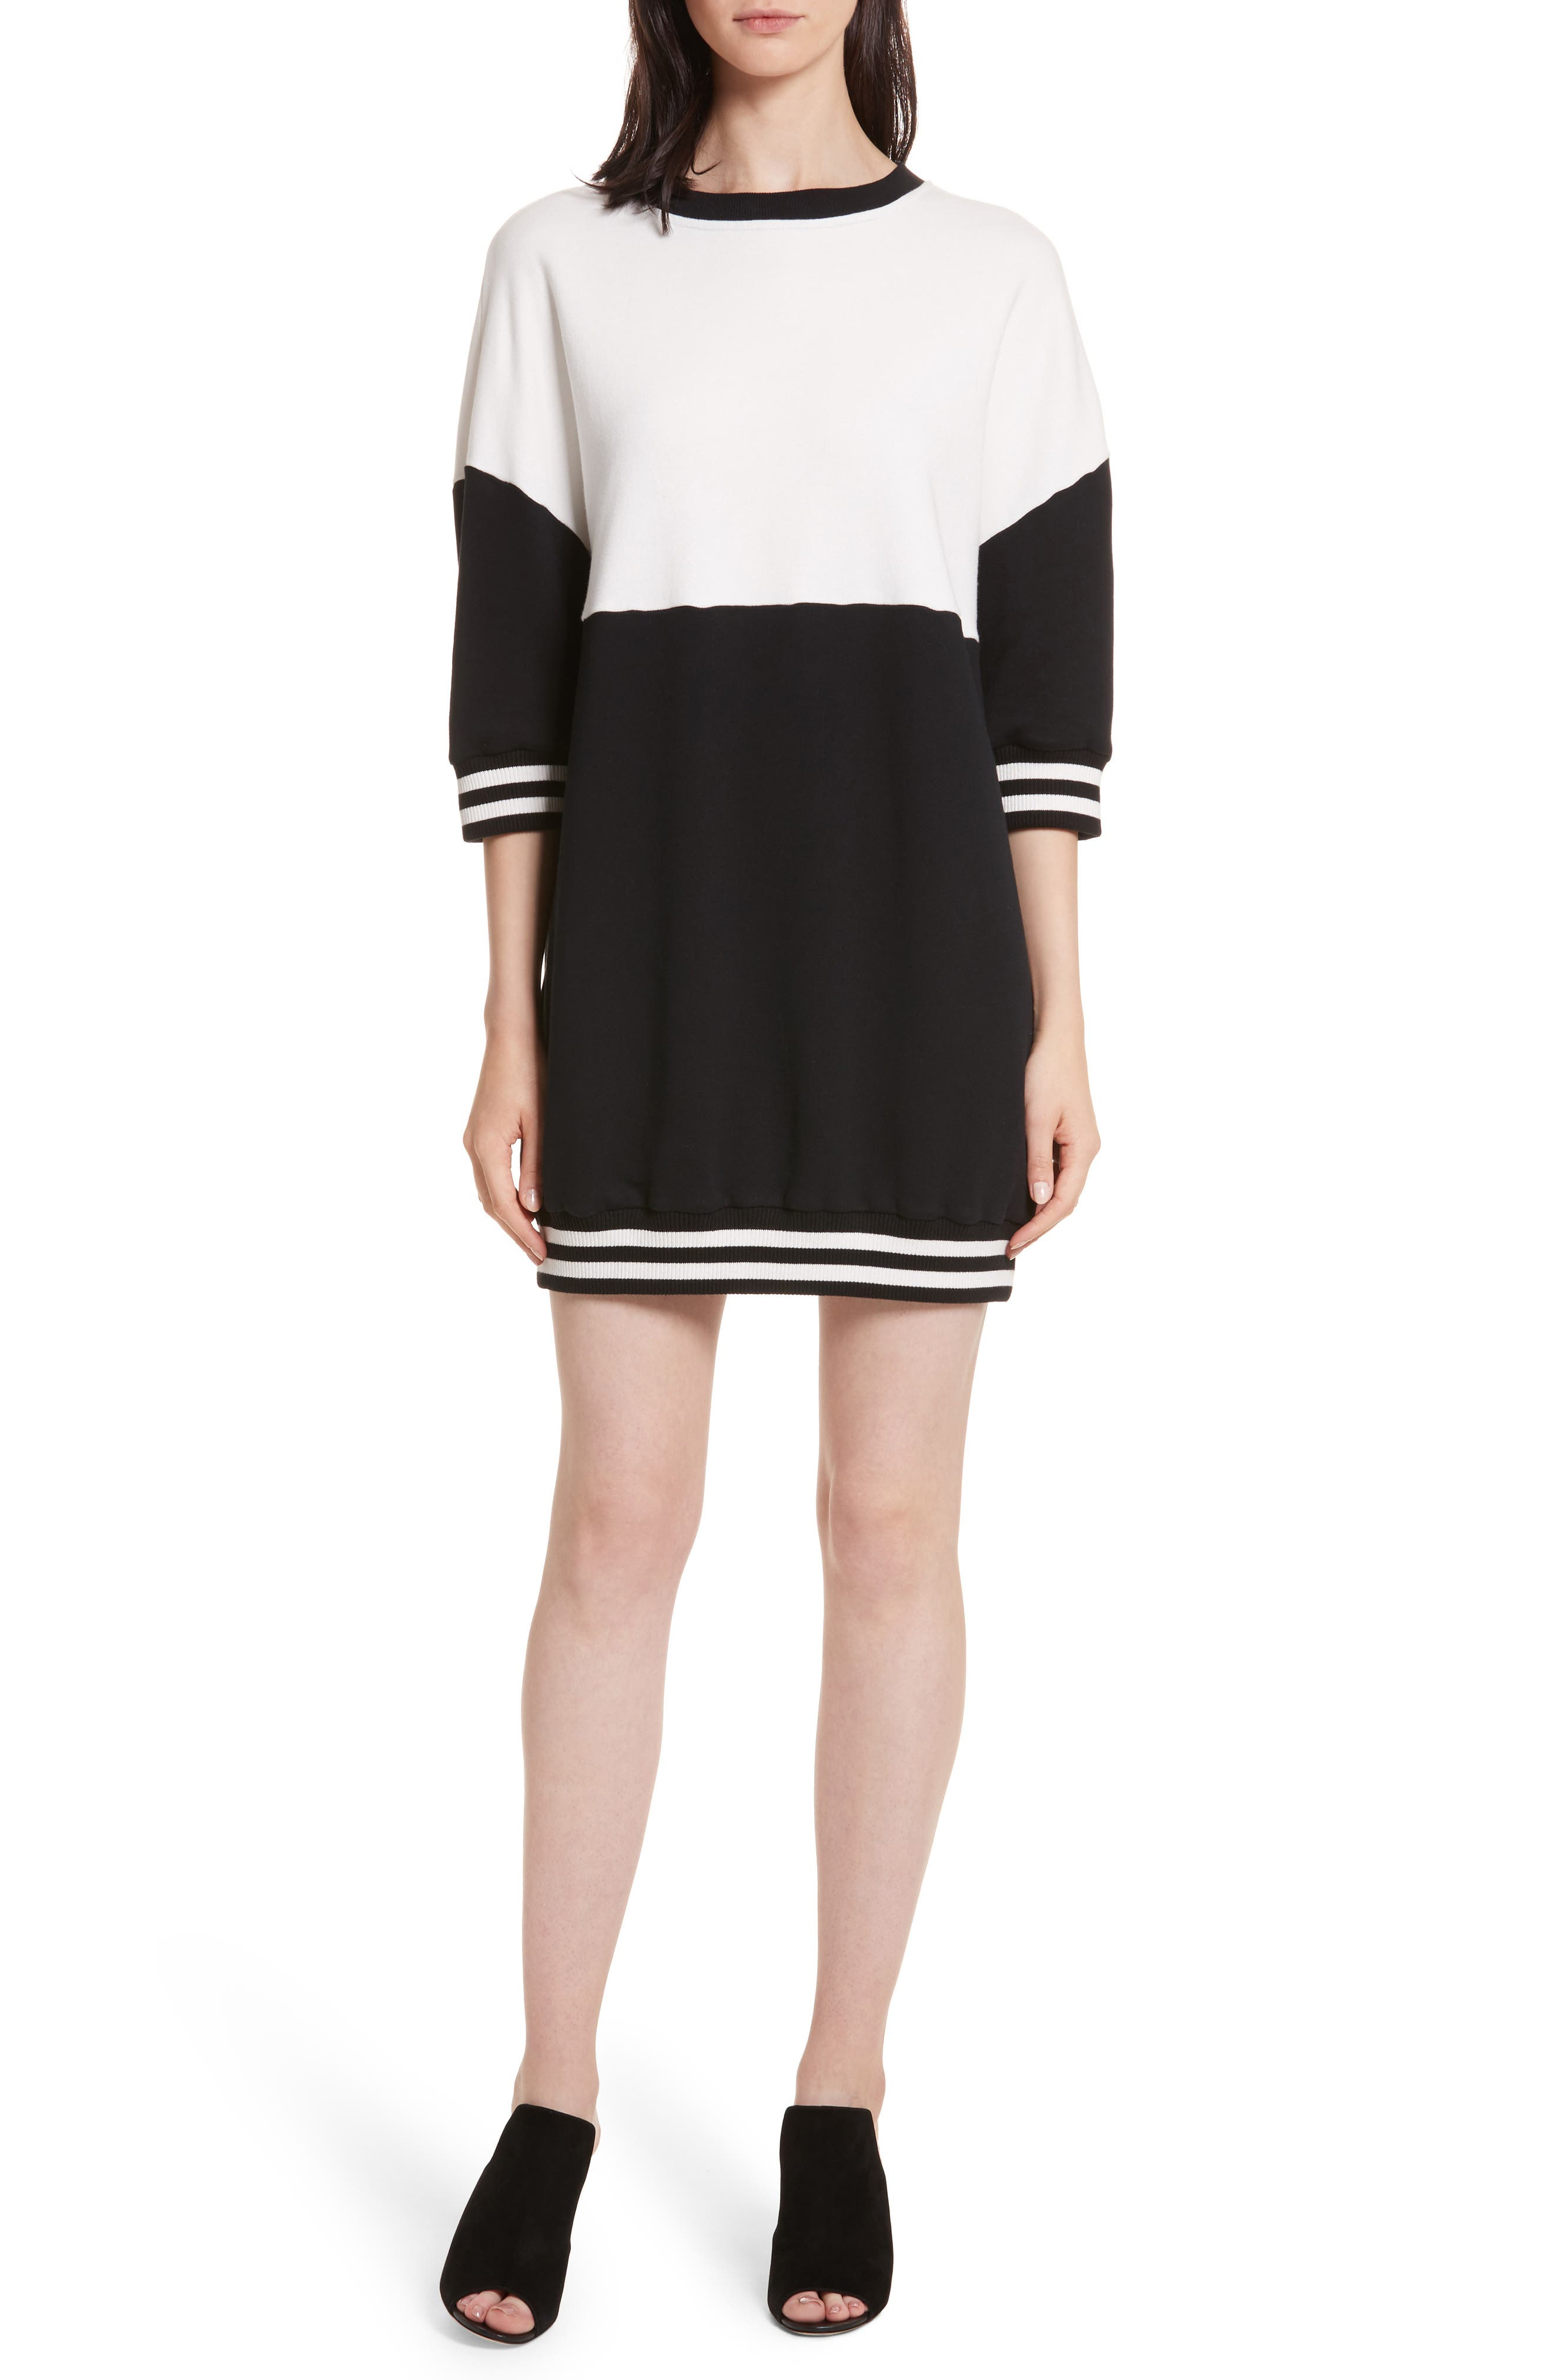 Gussie Colorblock Sweatshirt Dress,                             Main thumbnail 1, color,                             Black/ Off White